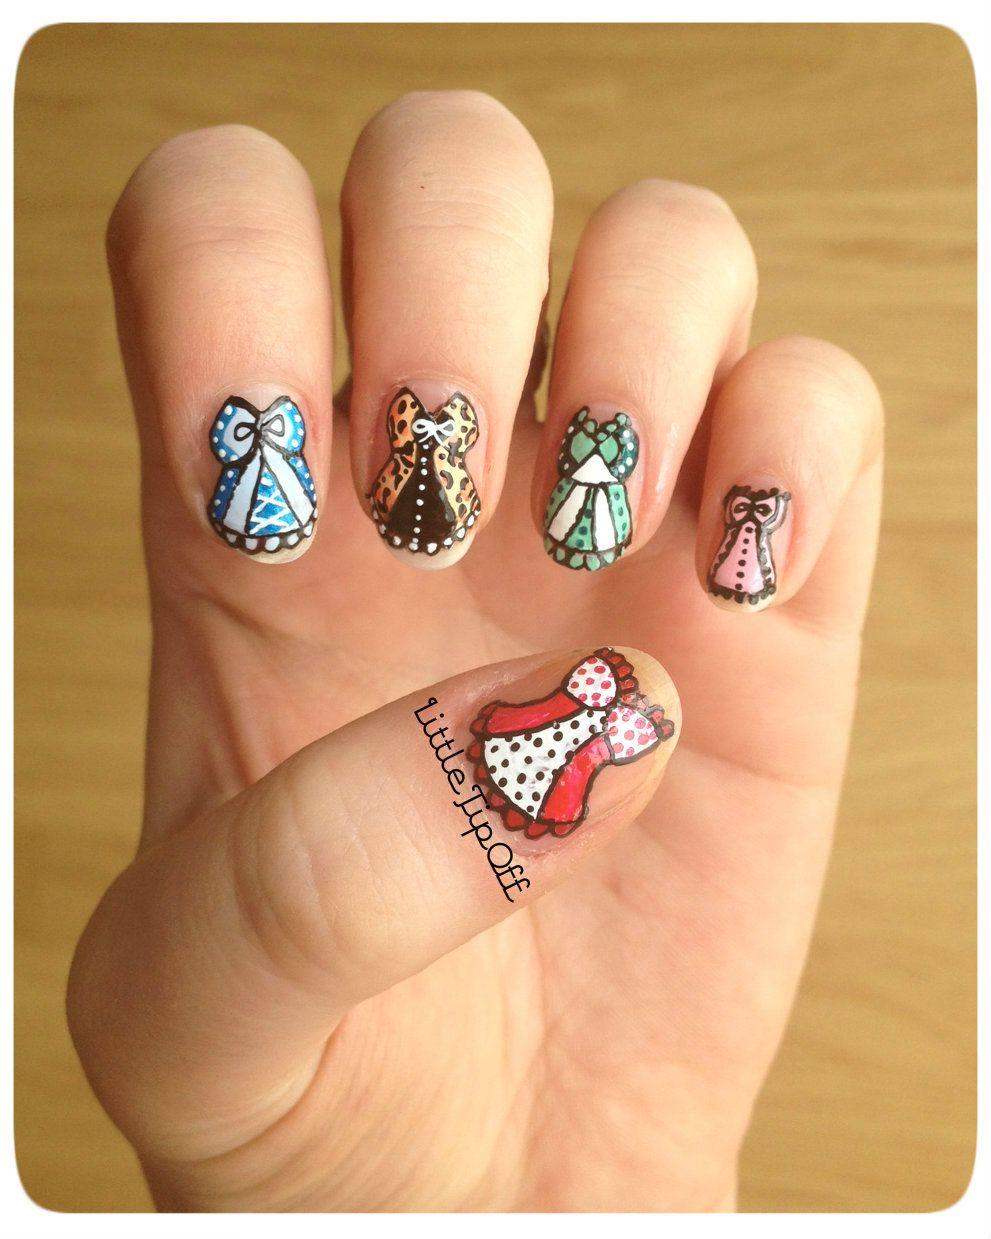 Corset Nail Designs | Little Tip Off | UK Nail Art Blog: Corset ...